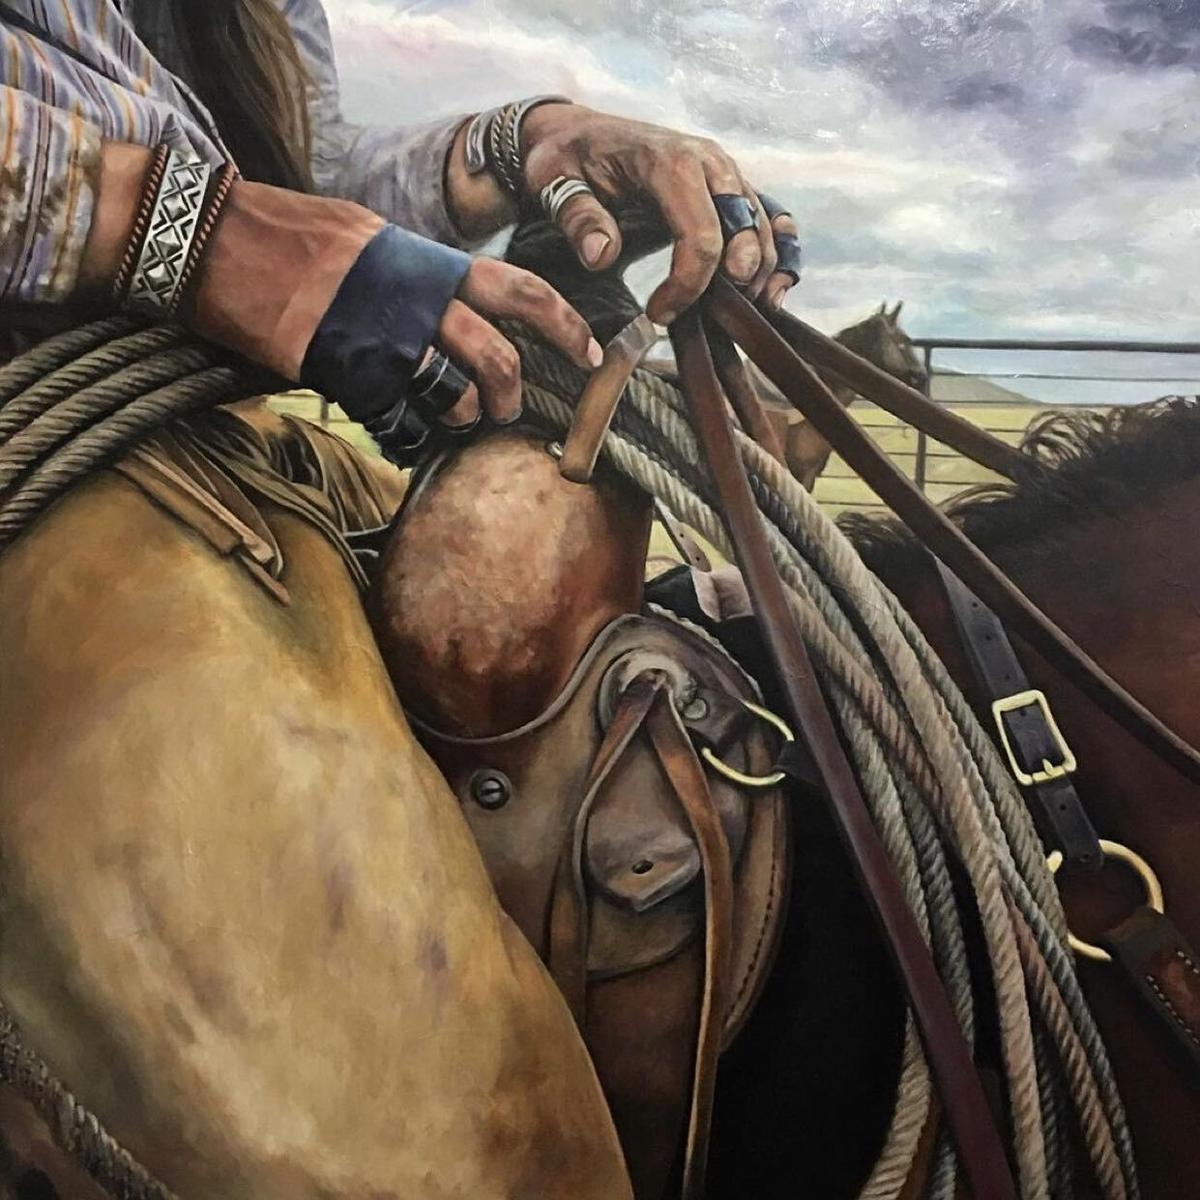 Working Hands by Susan Hartenhoff